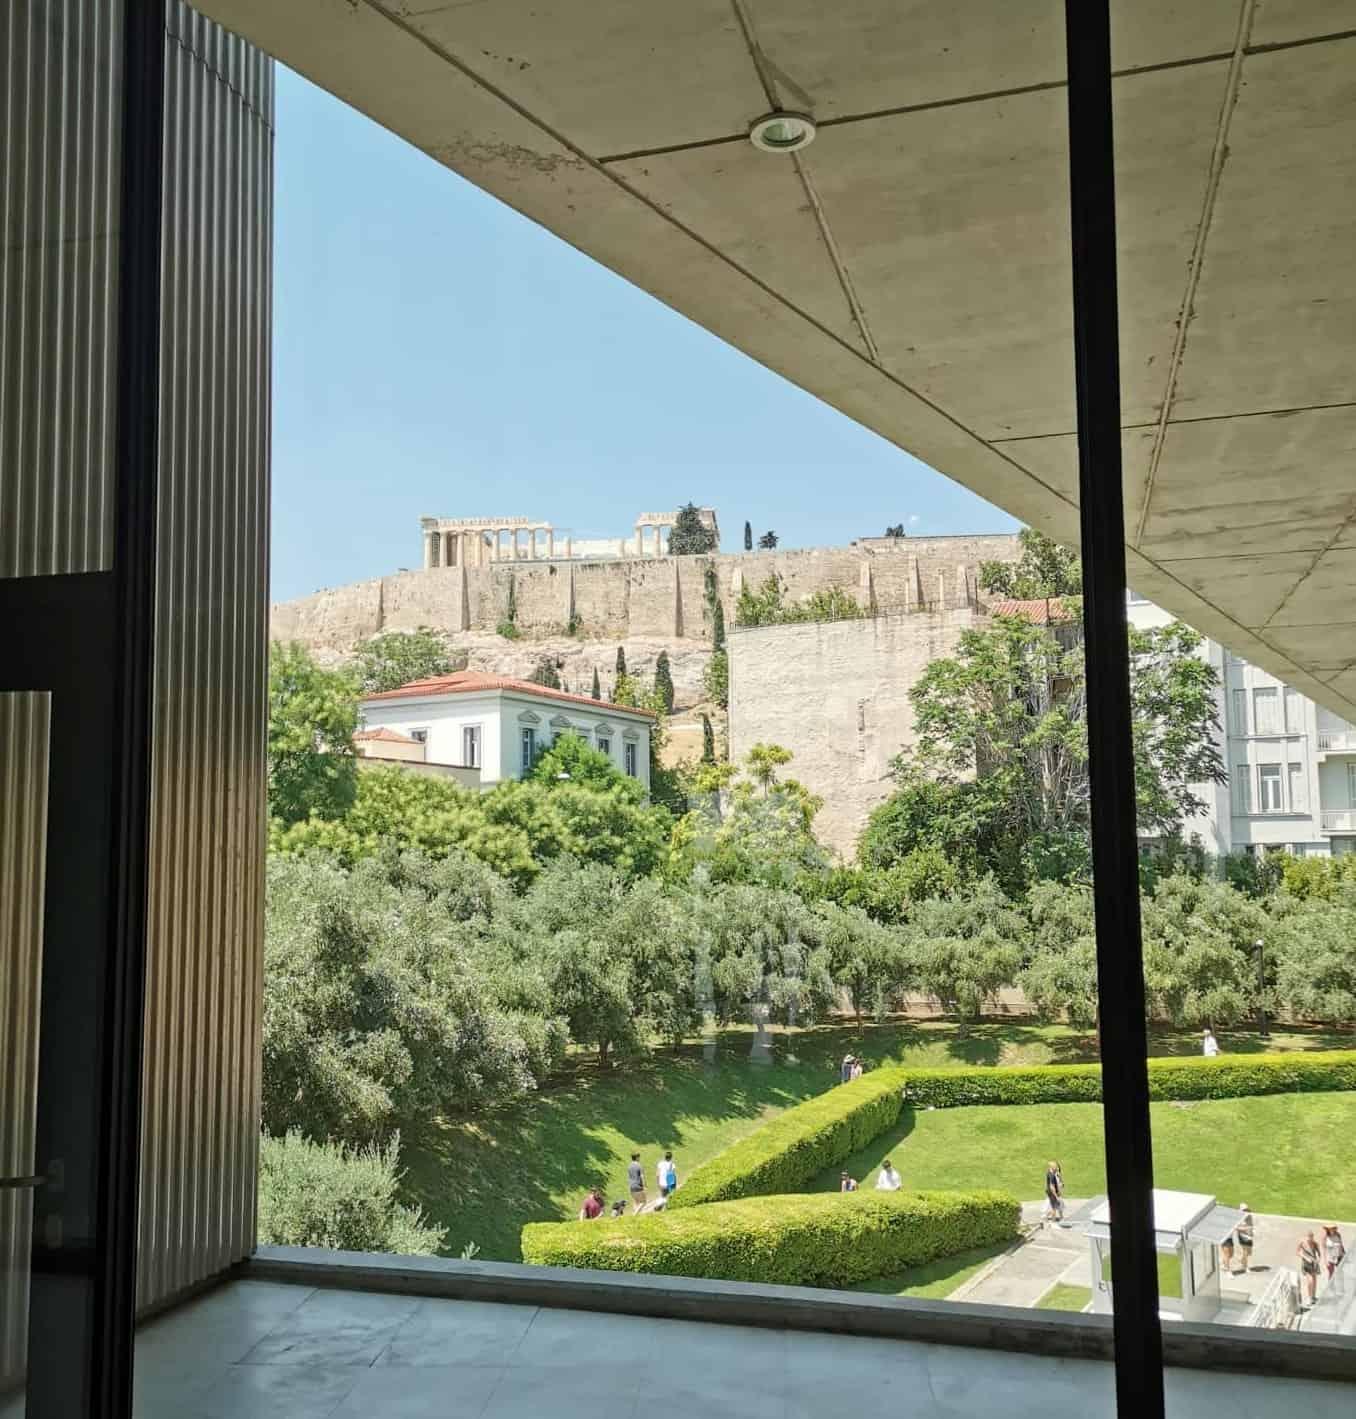 4 Most important museums - Acropolis Museum